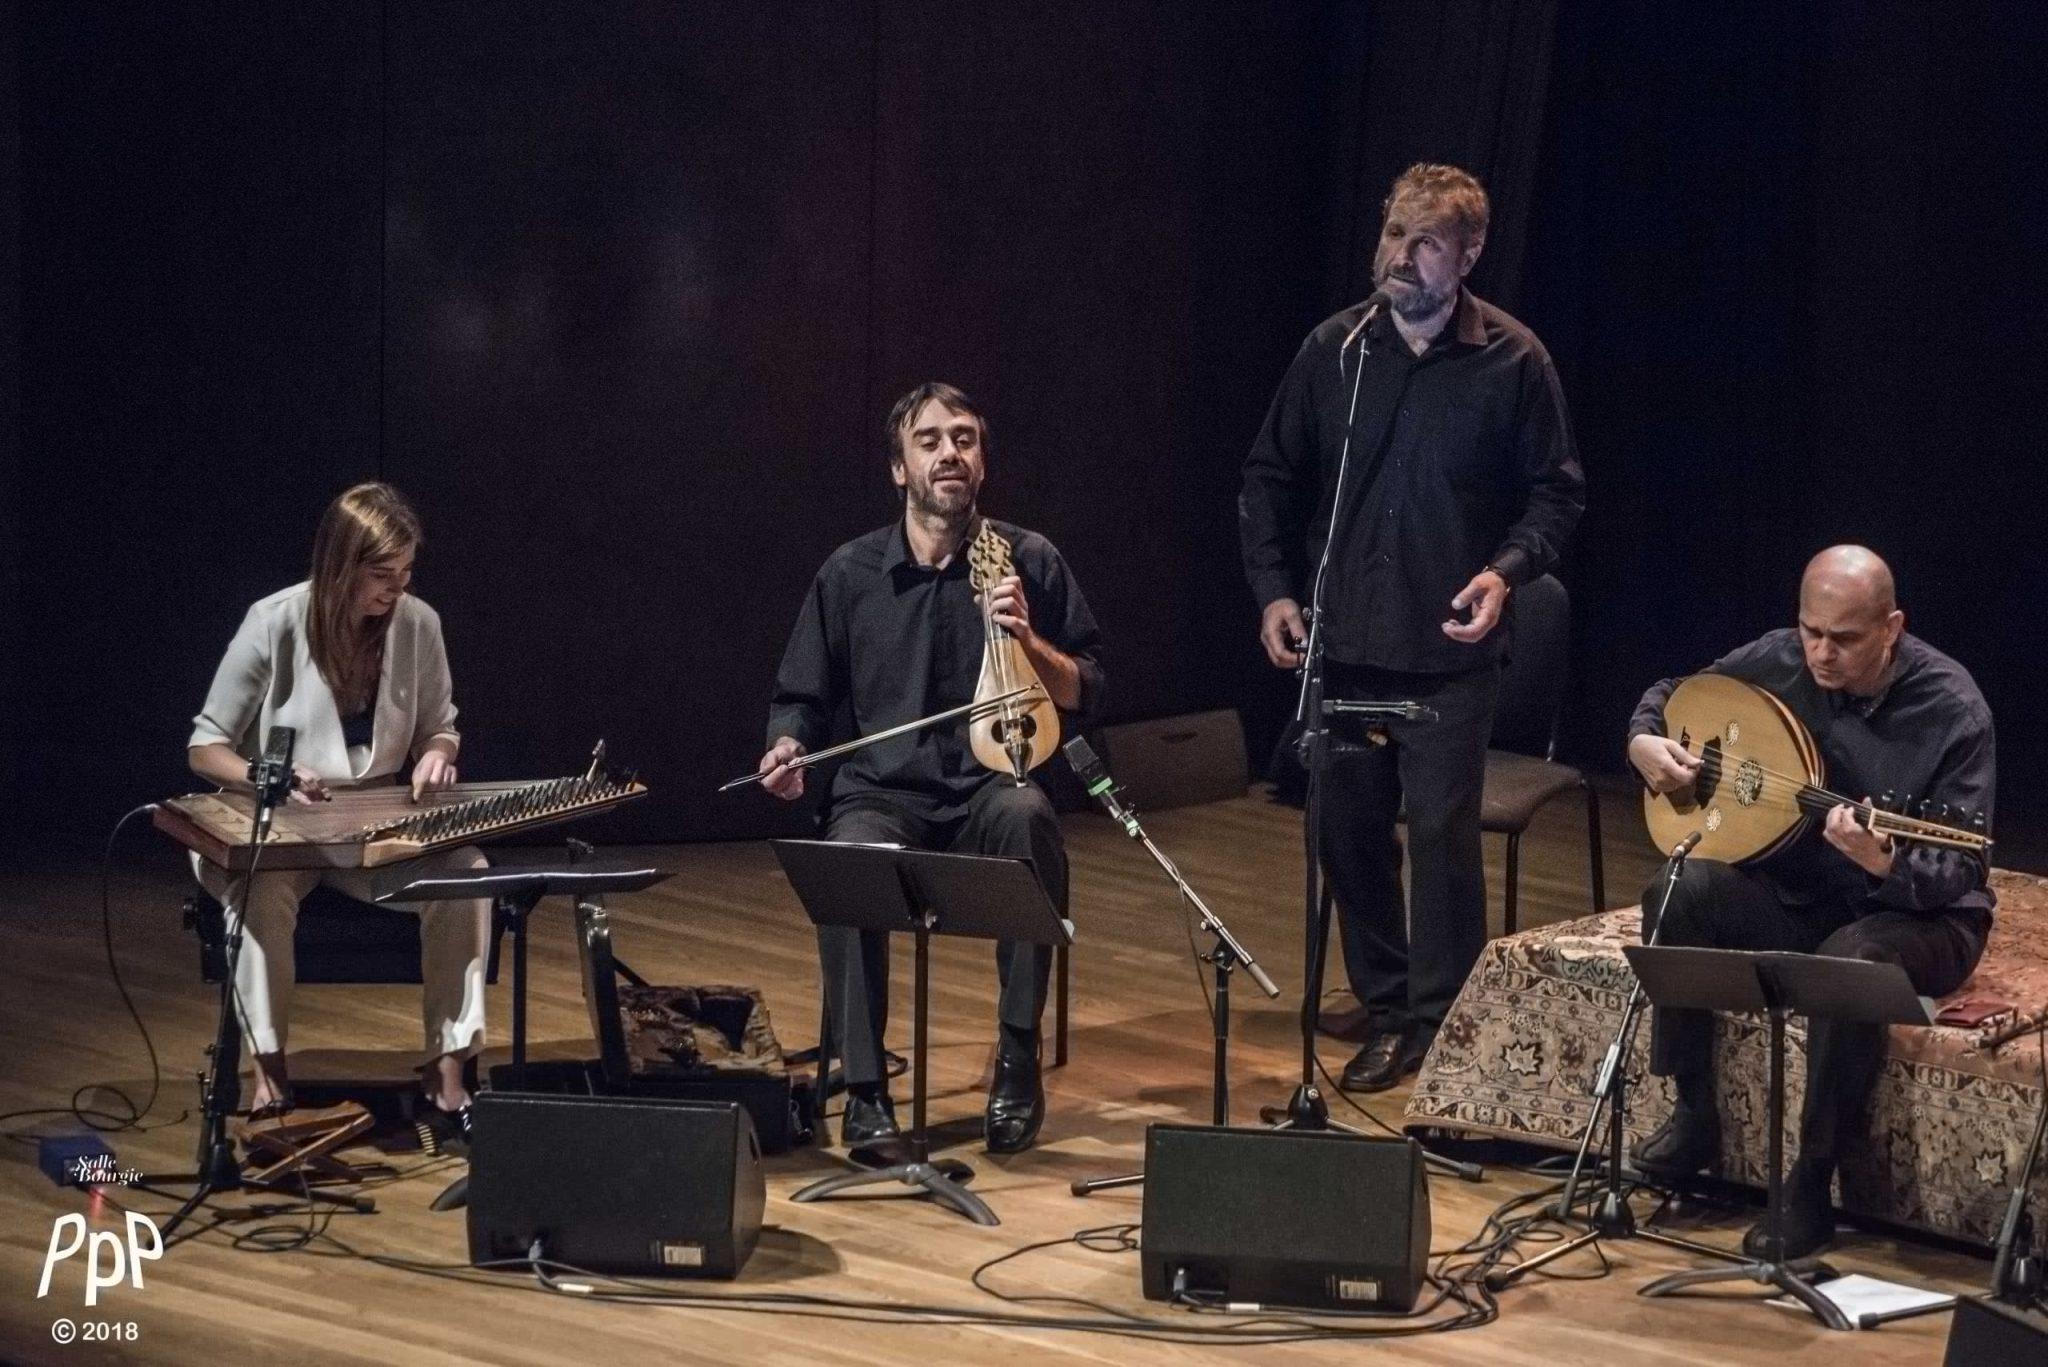 Didem Basar and En Chordais on stage